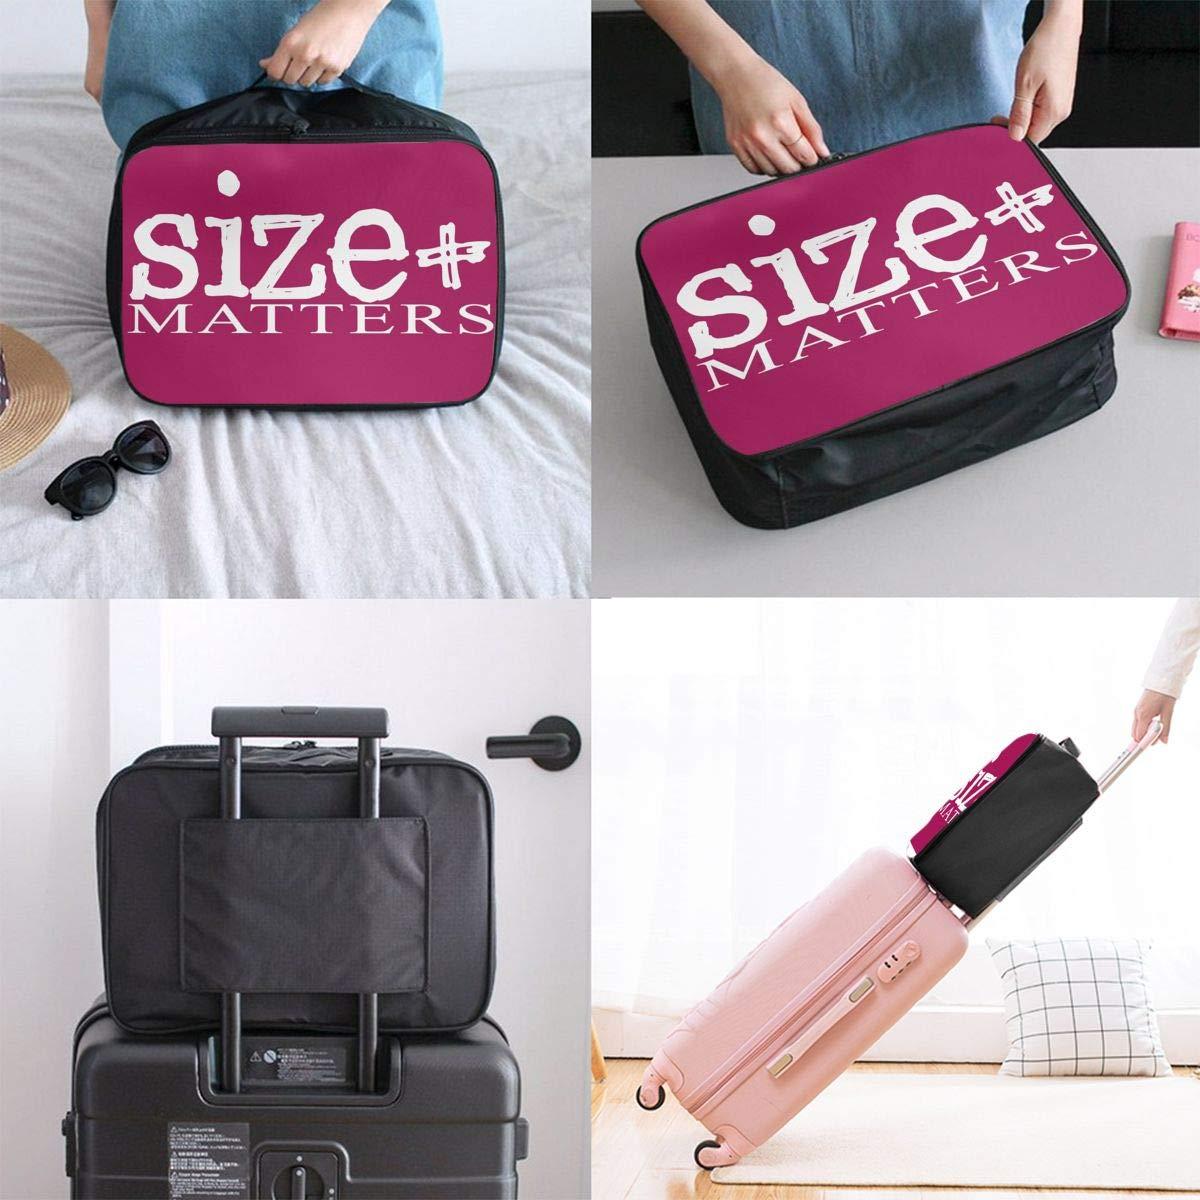 Travel Luggage Duffle Bag Lightweight Portable Handbag Size Matters Large Capacity Waterproof Foldable Storage Tote